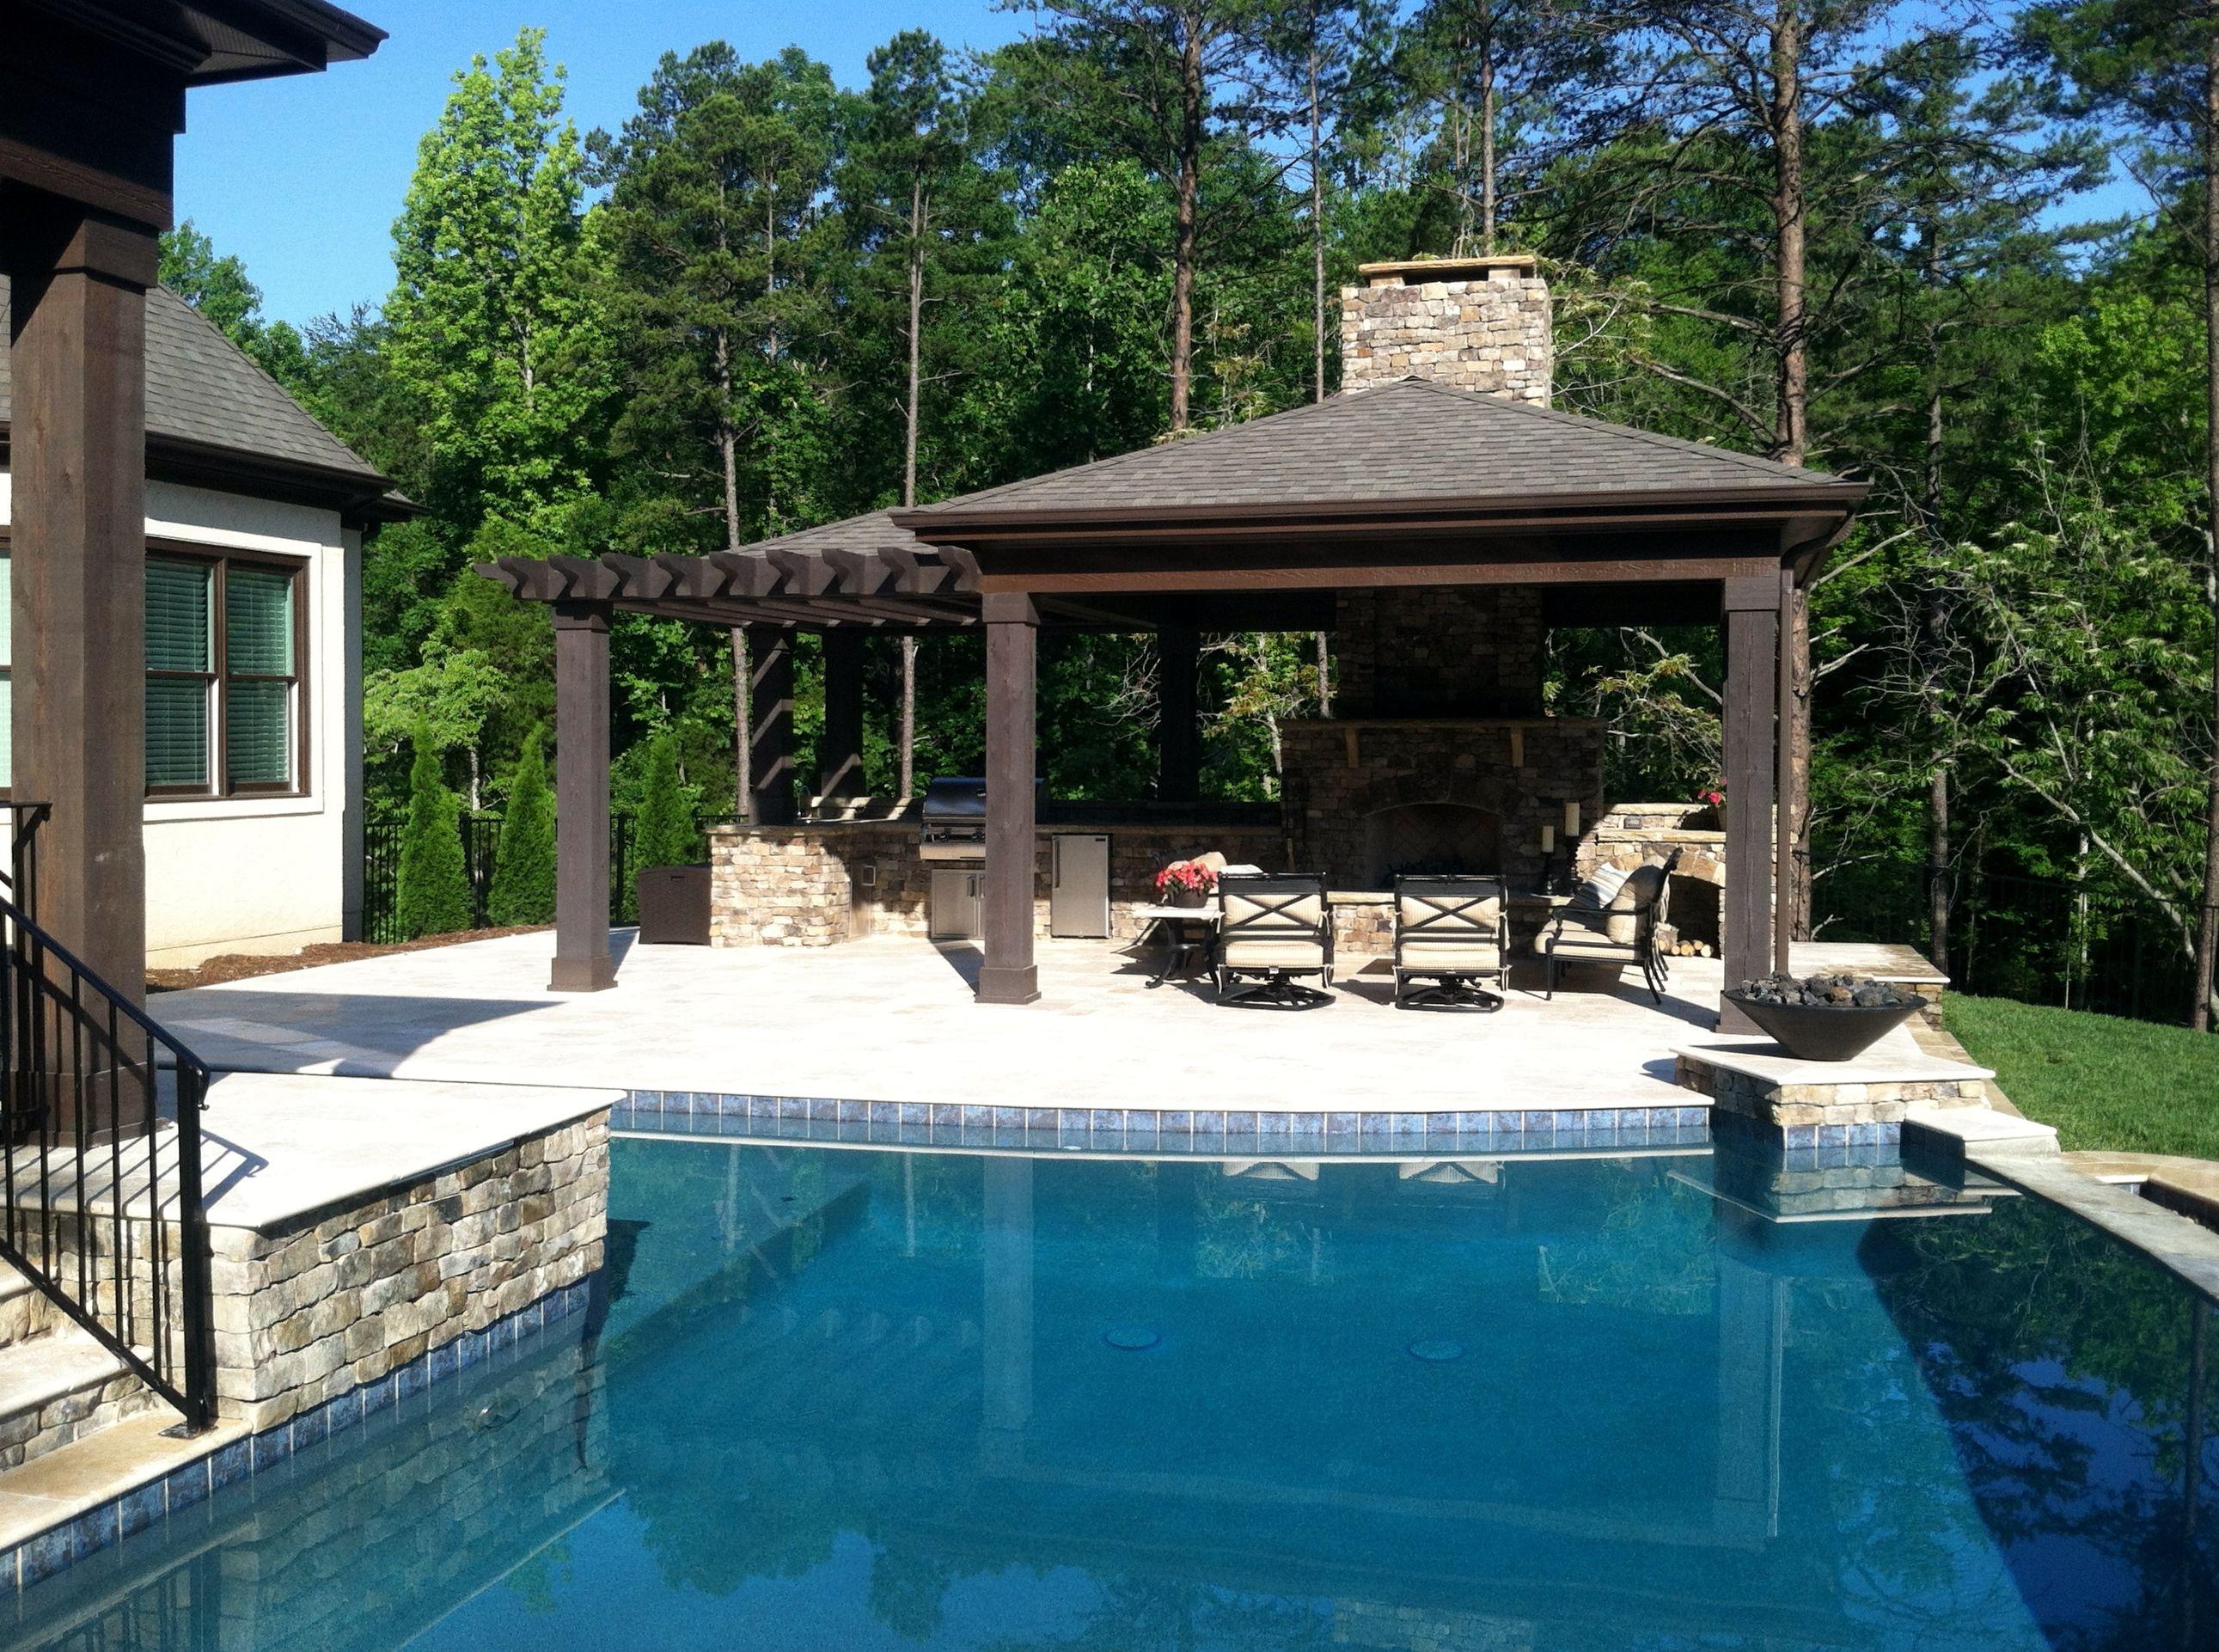 Example of Aqua Blue Pebble Sheen Backyard dreams